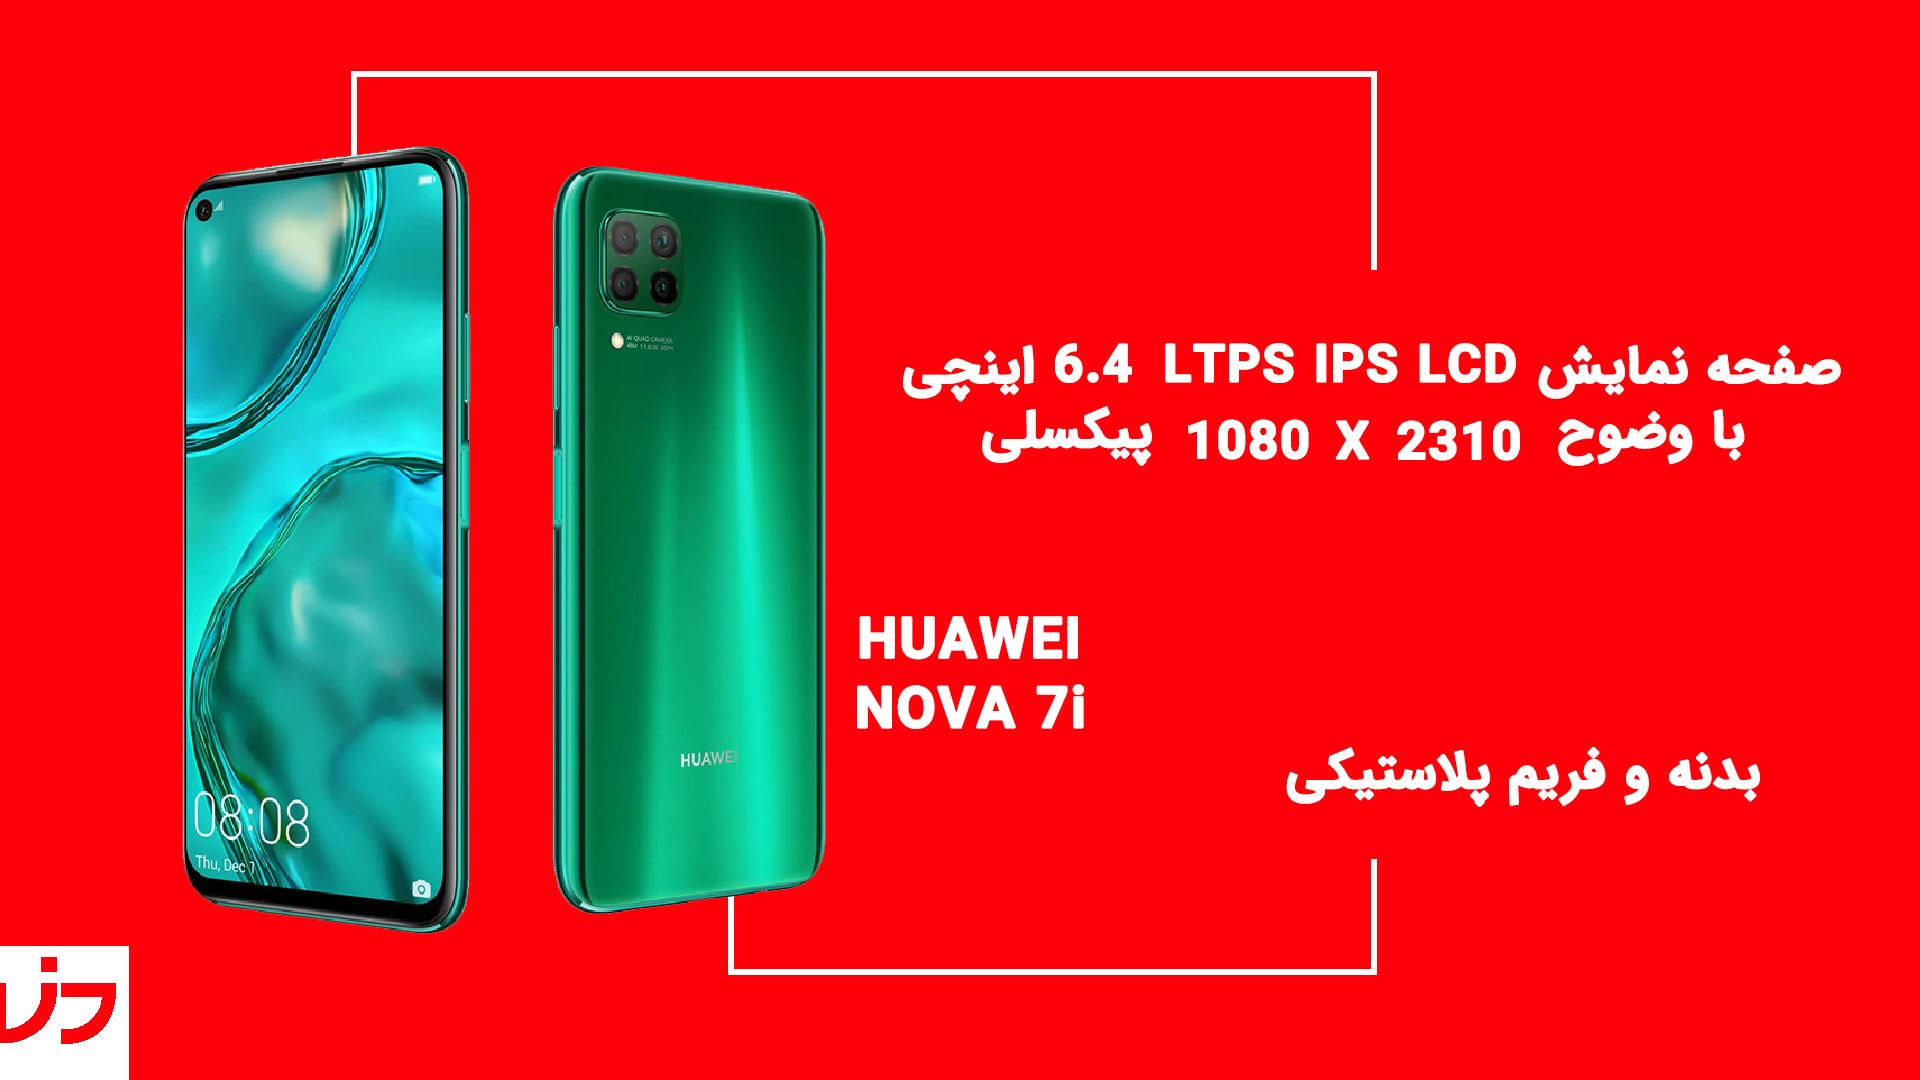 مشخصات گوشی Huawei Nova 7i - بررسی گوشی Huawei Nova 7i